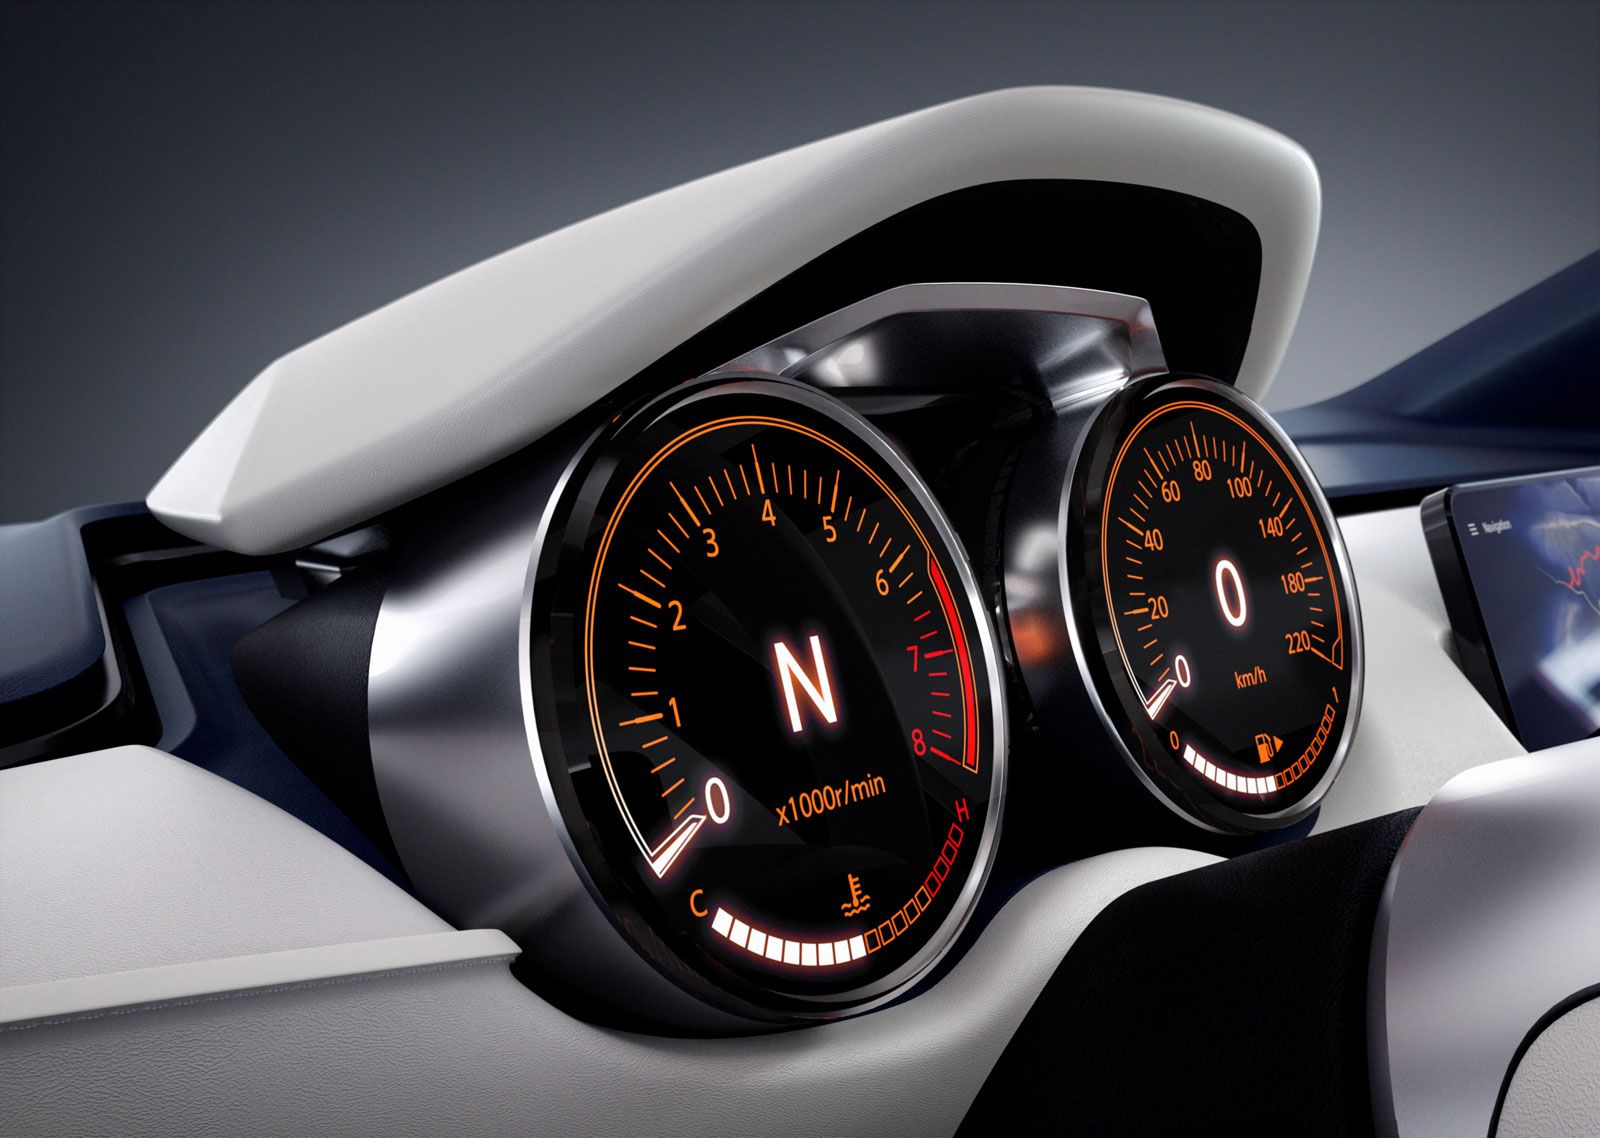 Nissan Sway Concept Interior - Instrument Panel